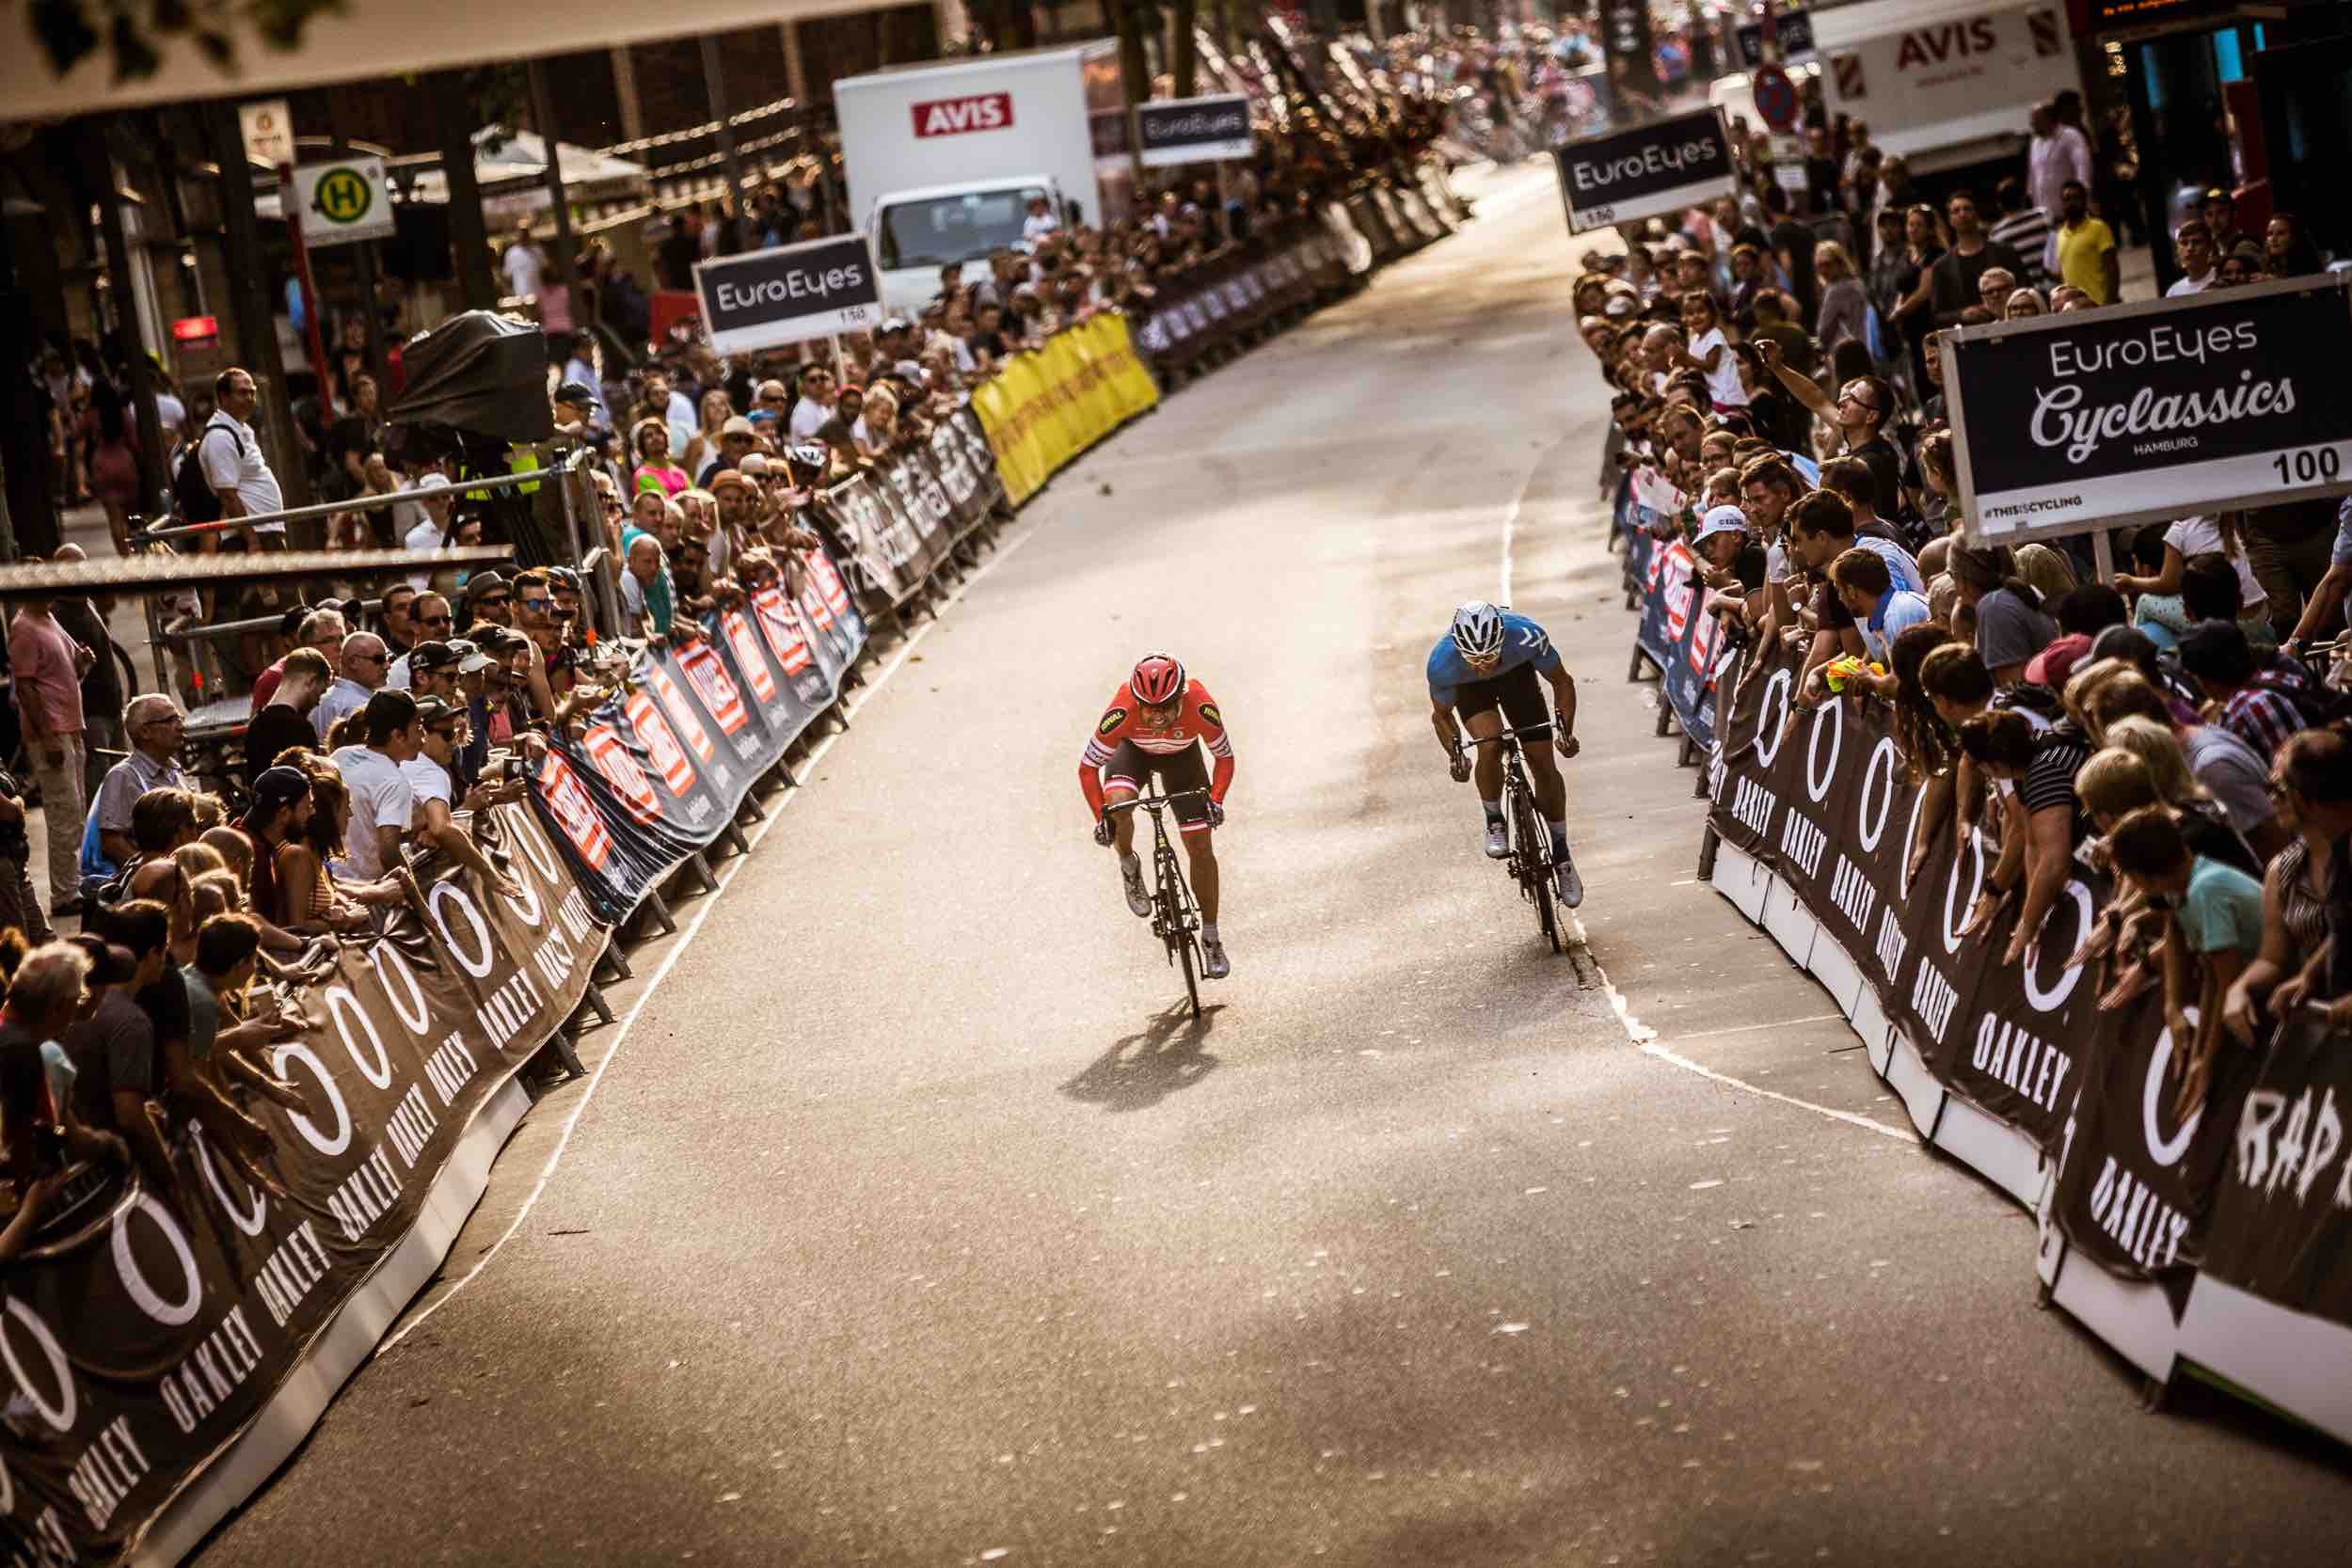 Rad-Race-Battle-Hamburg_18-08-2018_A8A8857 Kopie.jpg